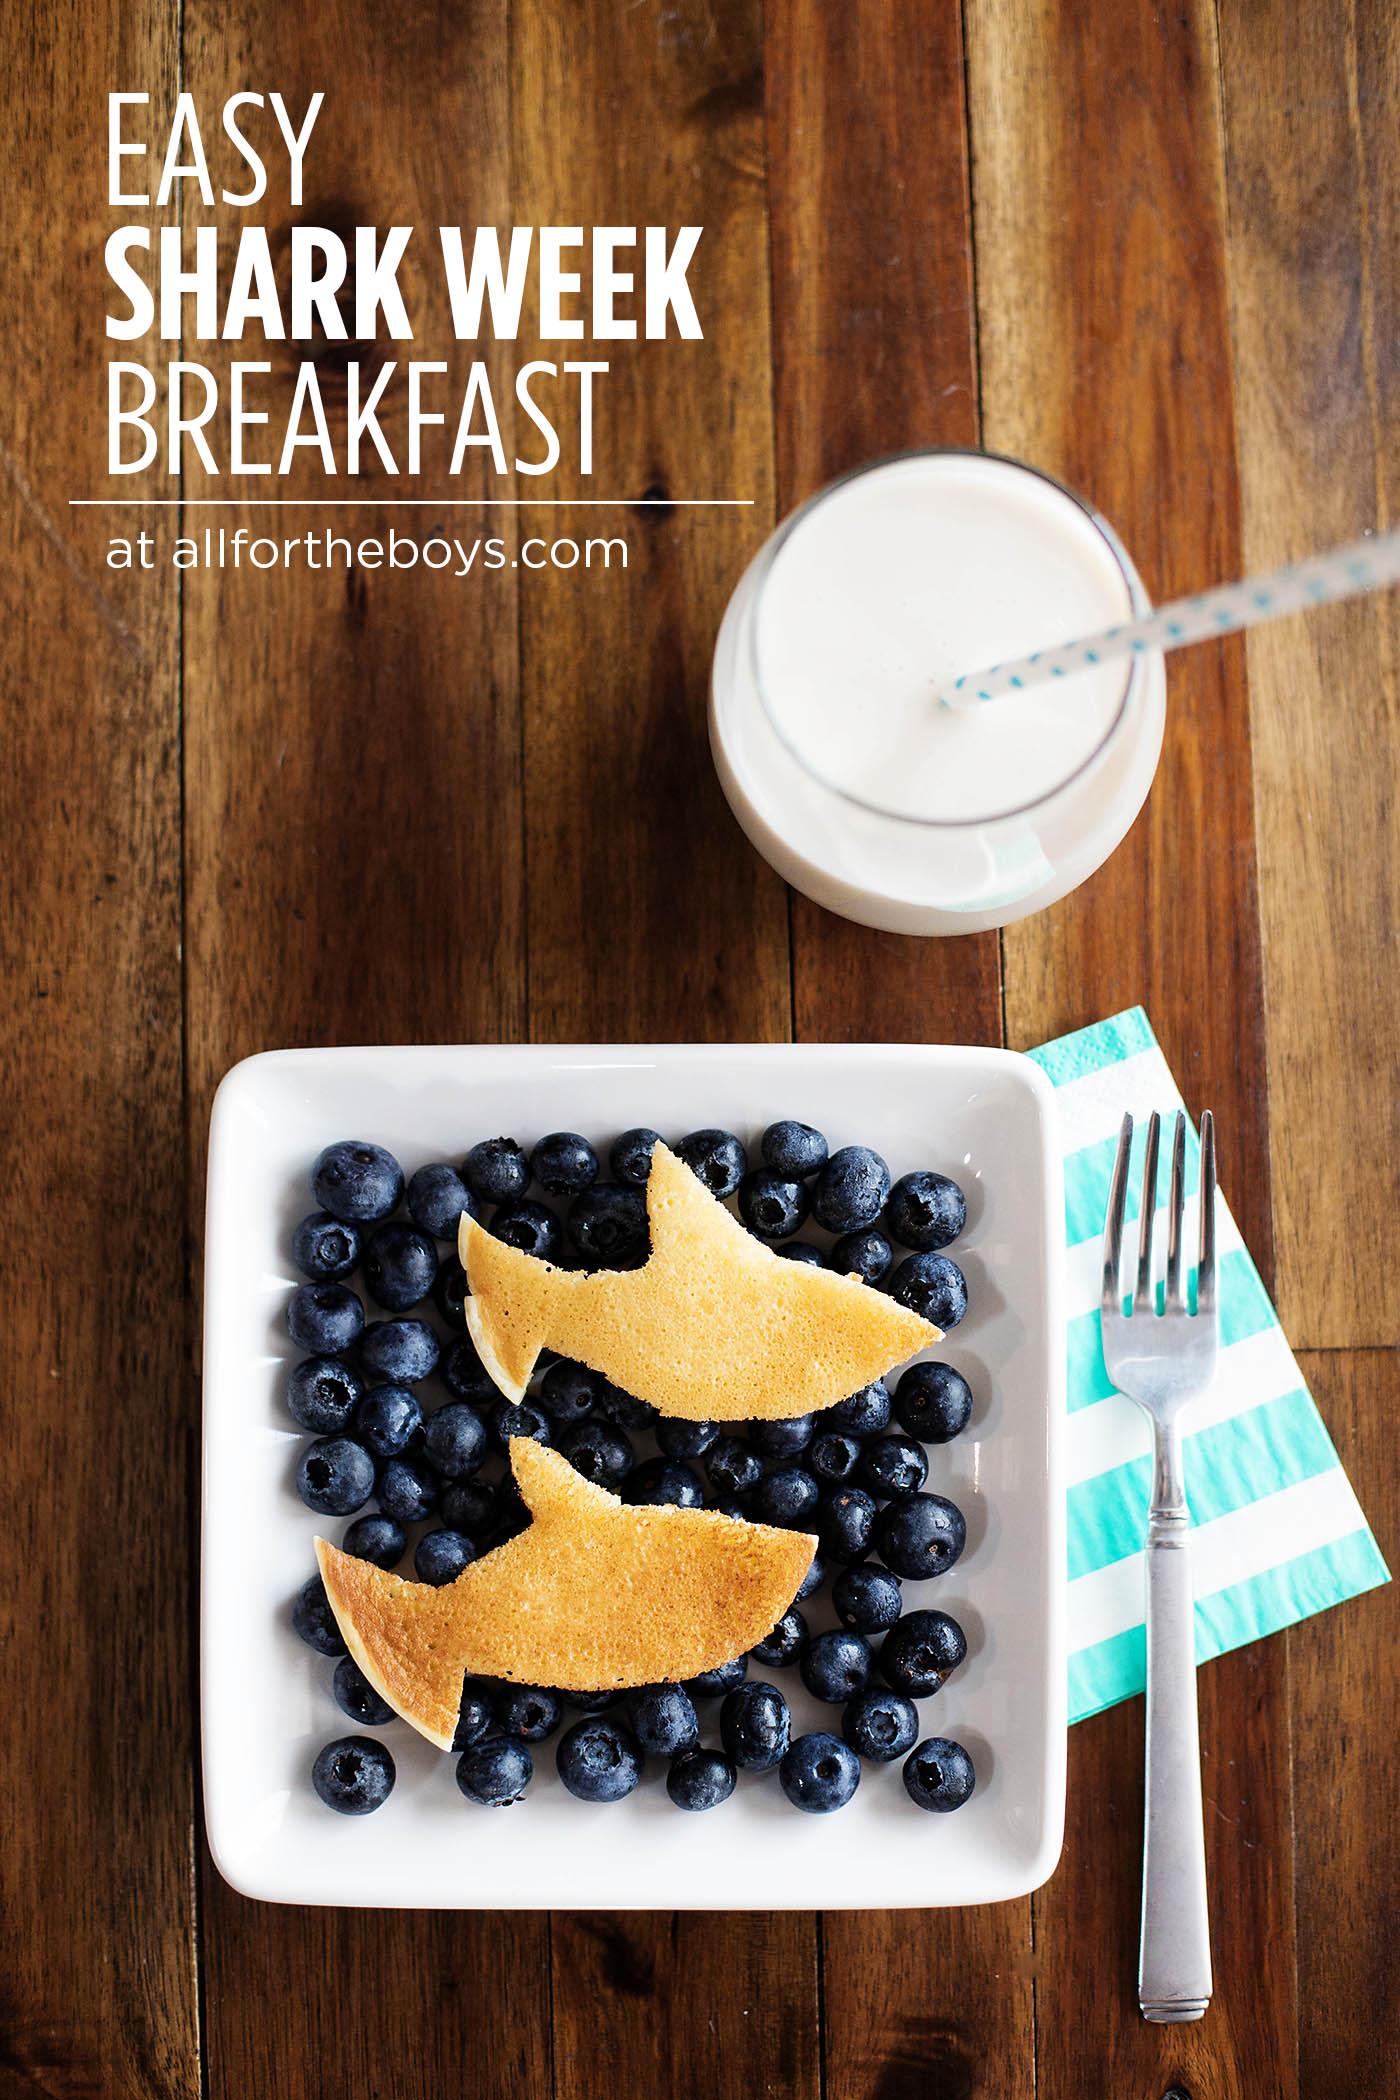 Easy shark week breakfast idea